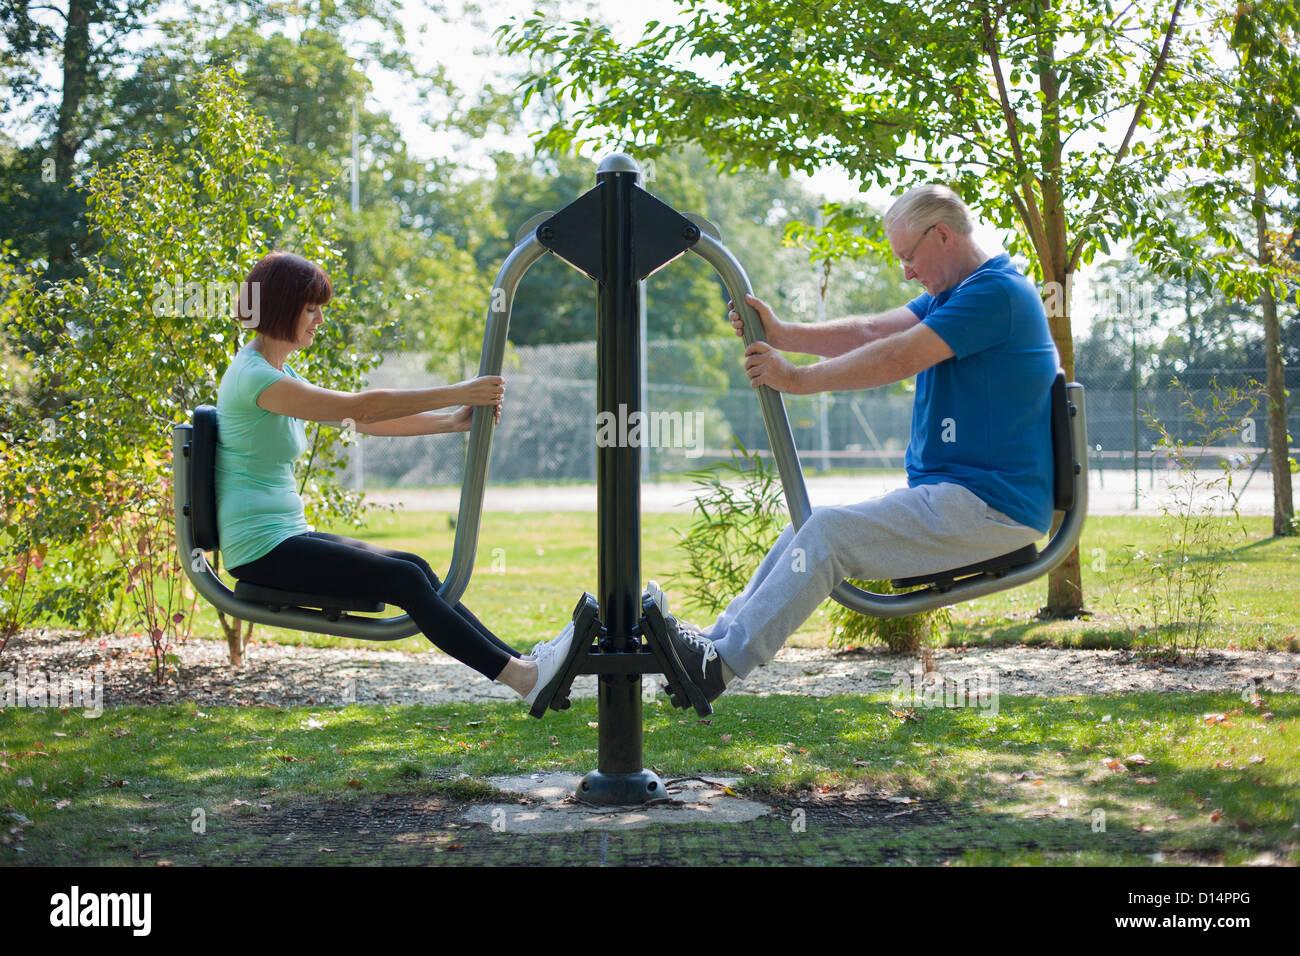 Older couple using exercise equipment - Stock Image